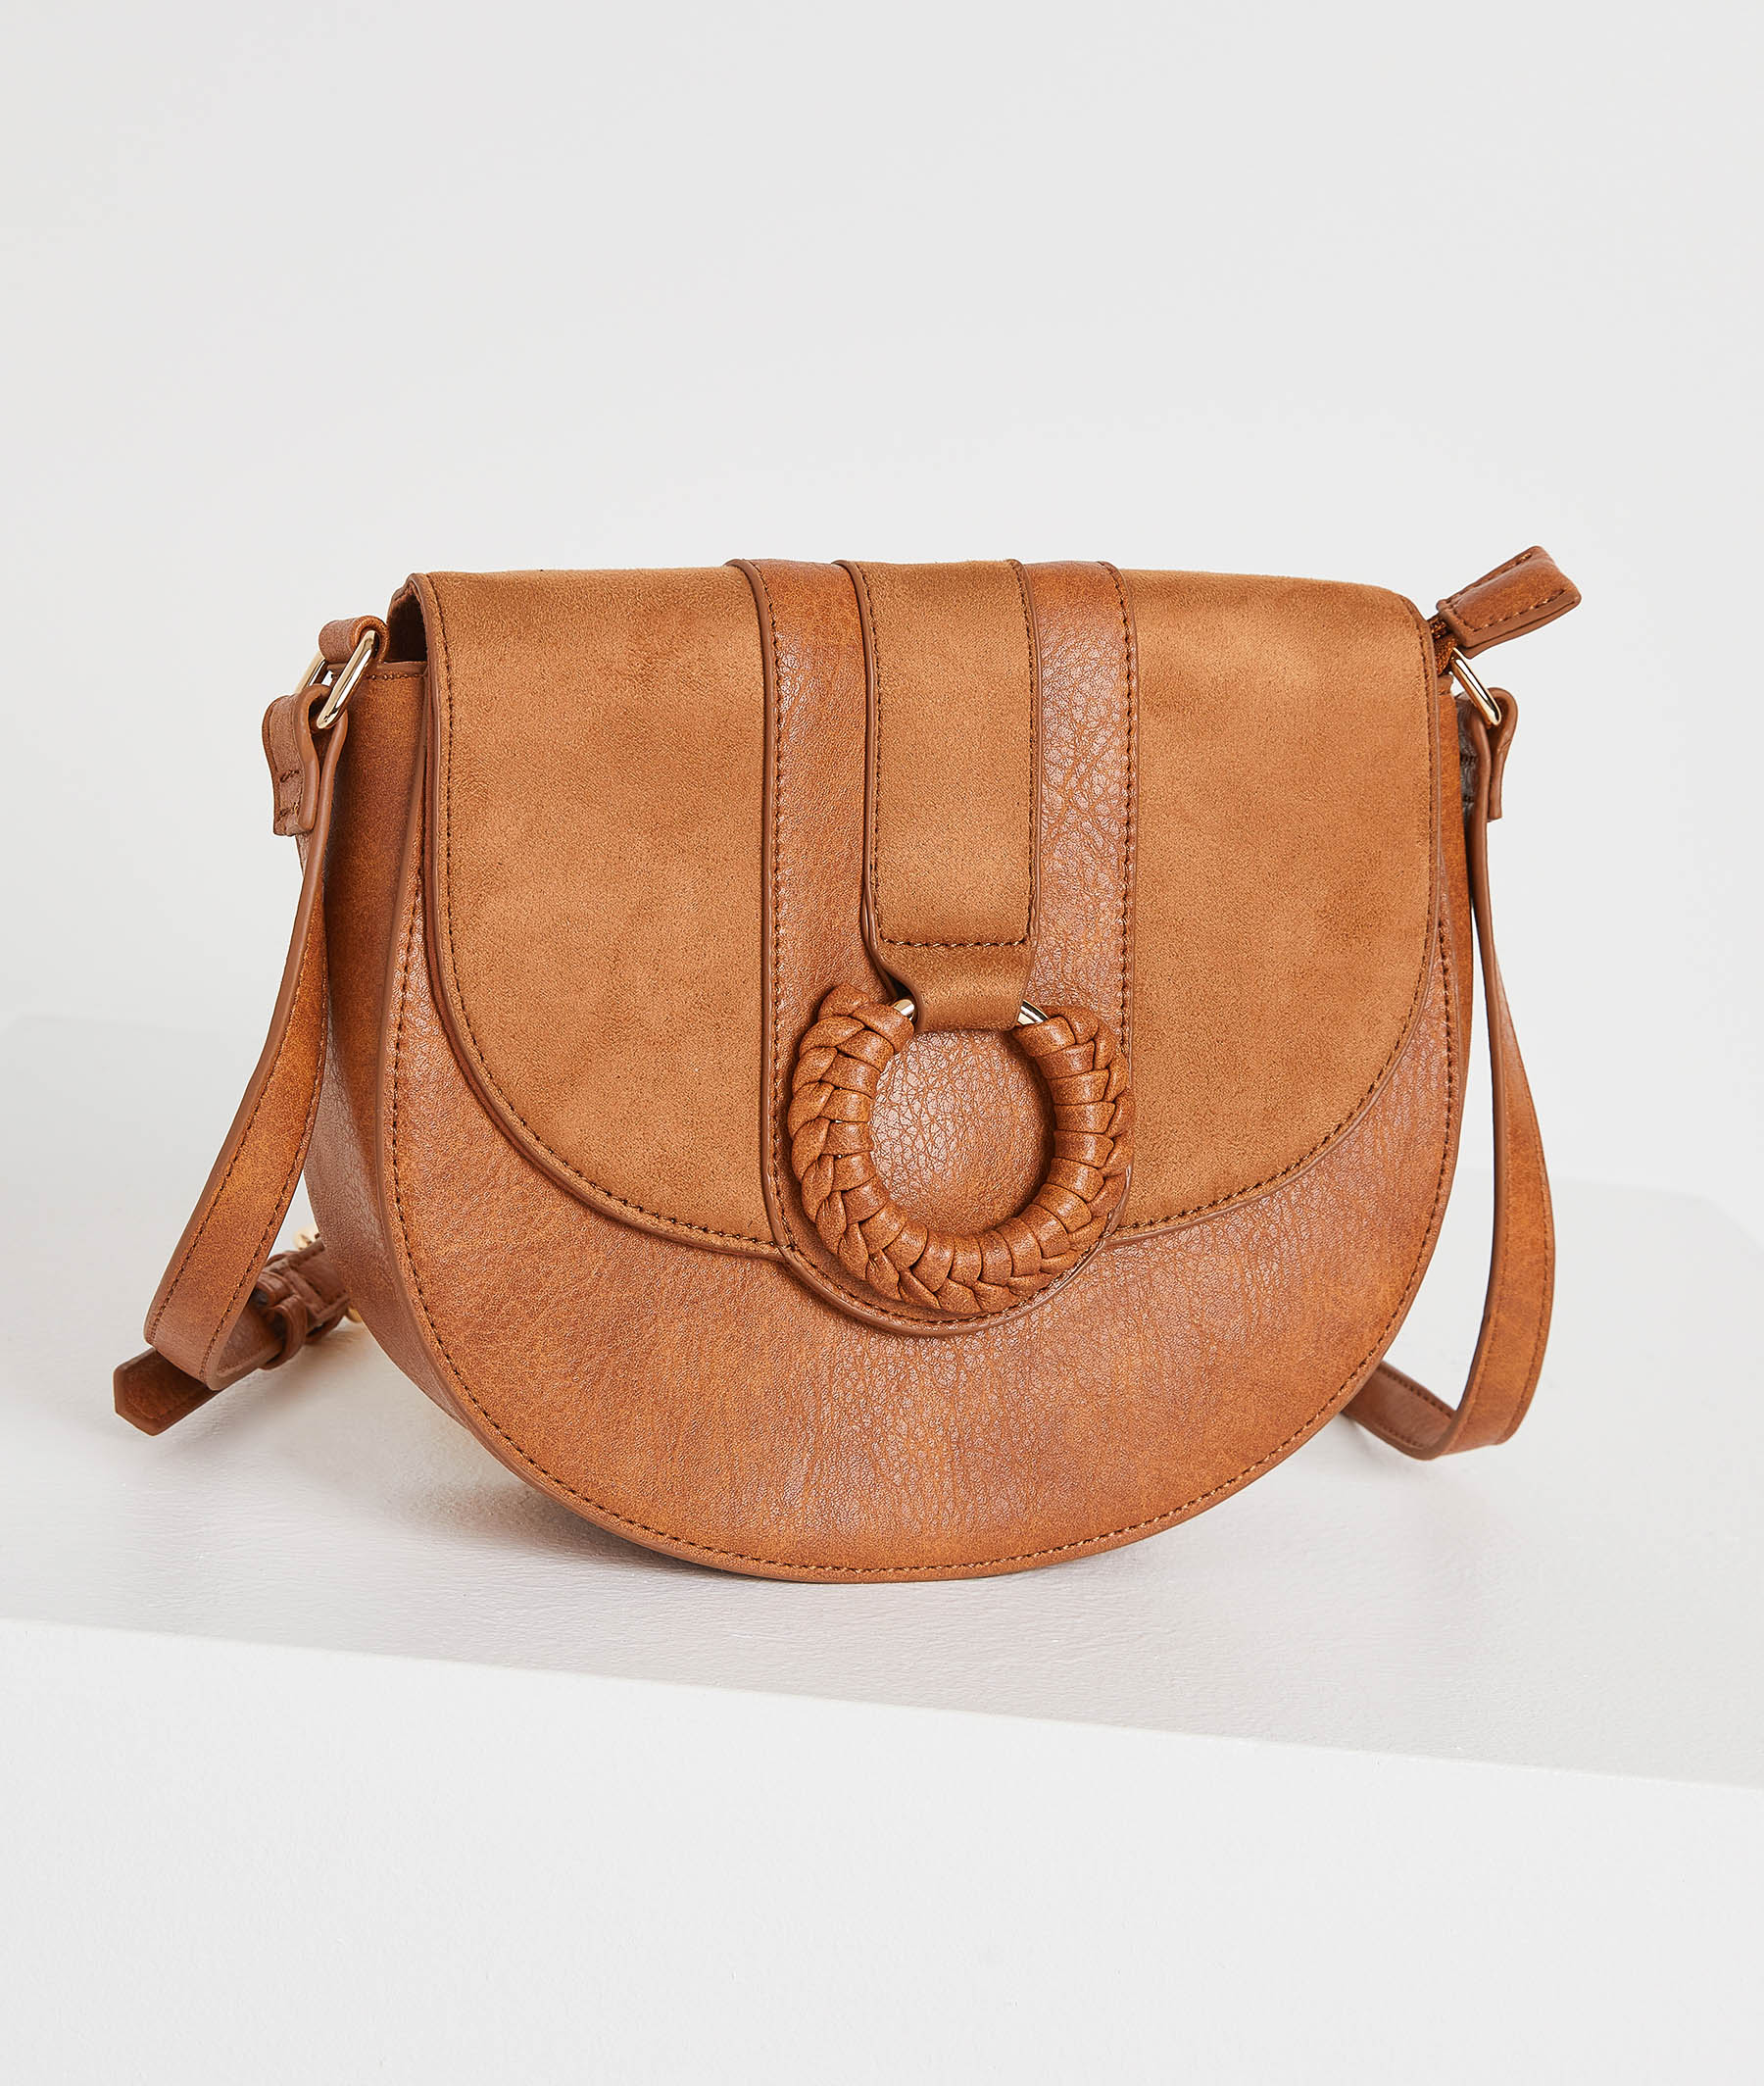 Petit sac camel bi-matière femme CAMEL